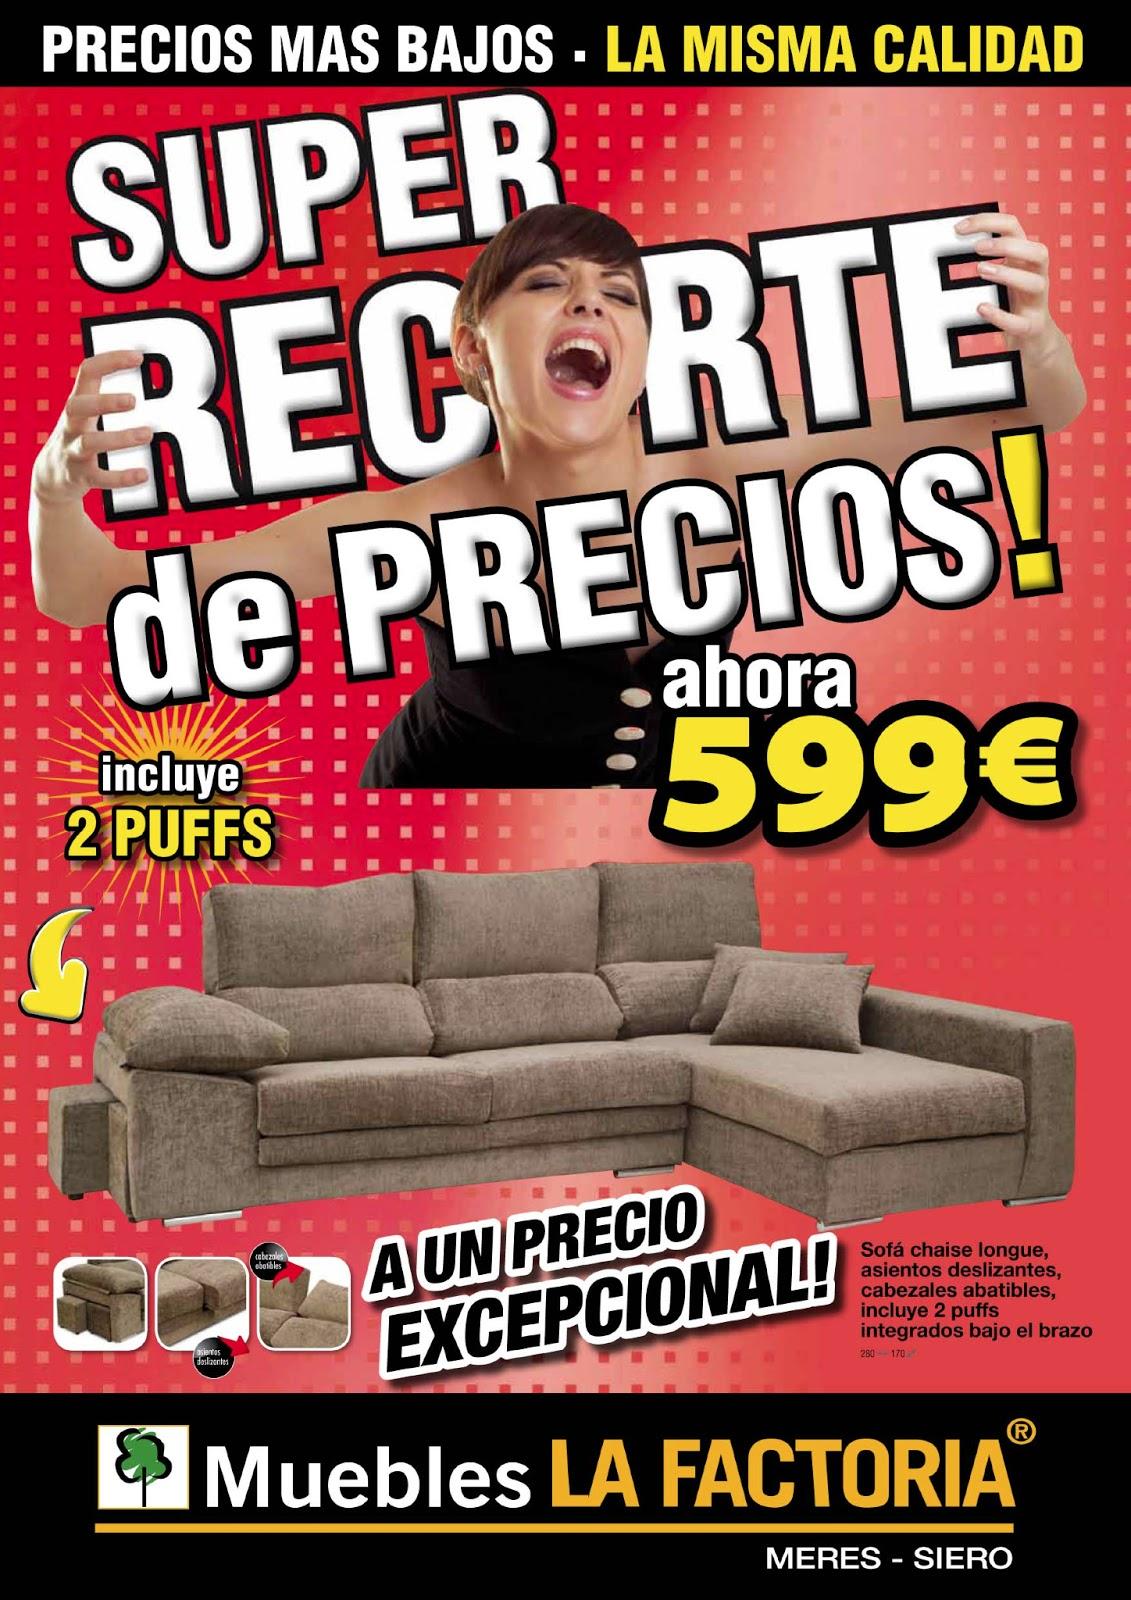 muebles la factoria martacorgo